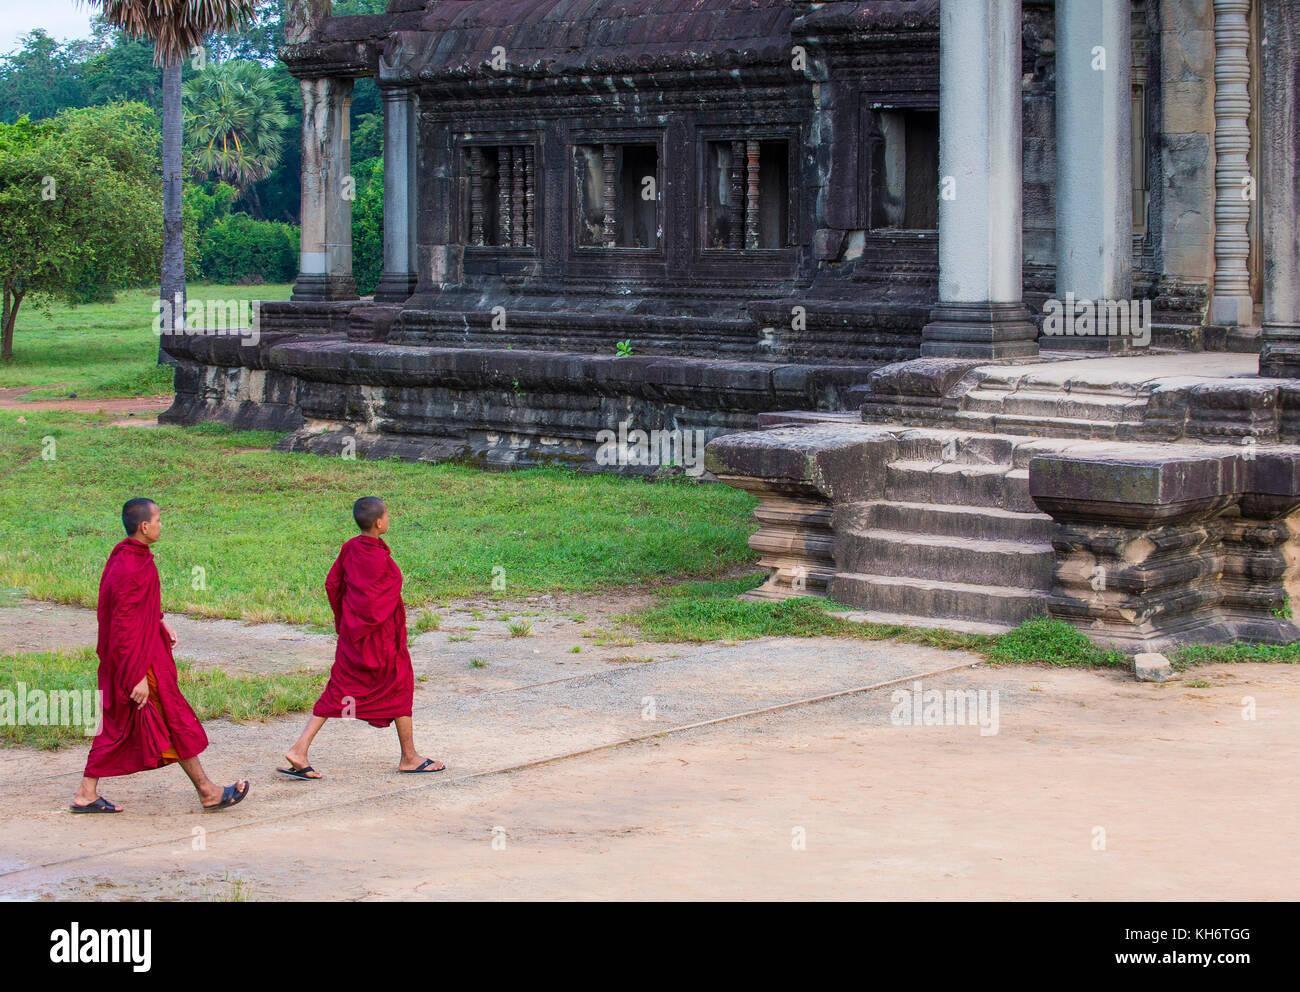 Budhist monjes en el templo de Angkor Wat en Siem Reap, Camboya Foto de stock